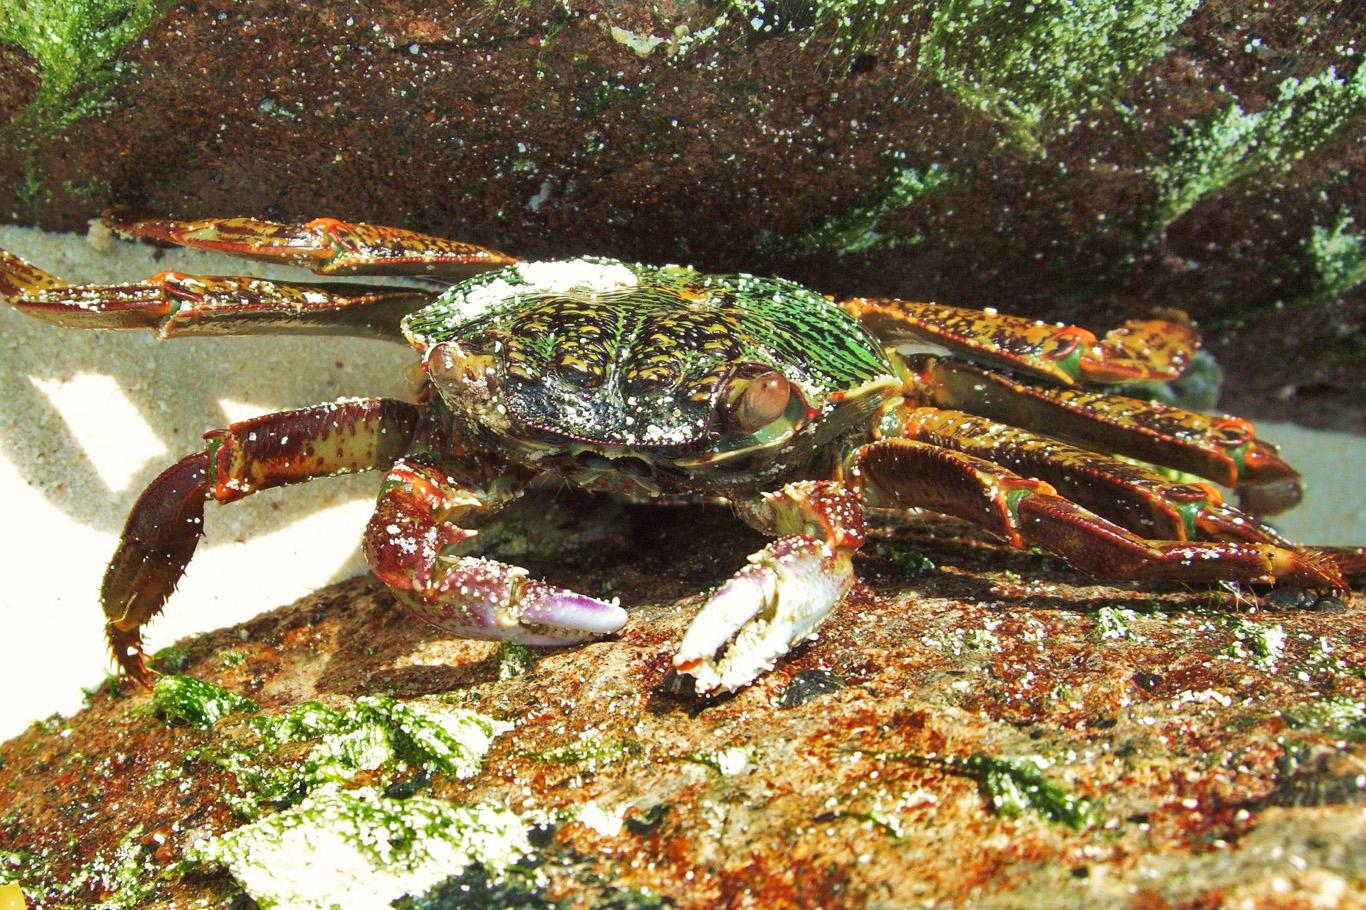 Crab in Kadmat, Lakshadweep Islands